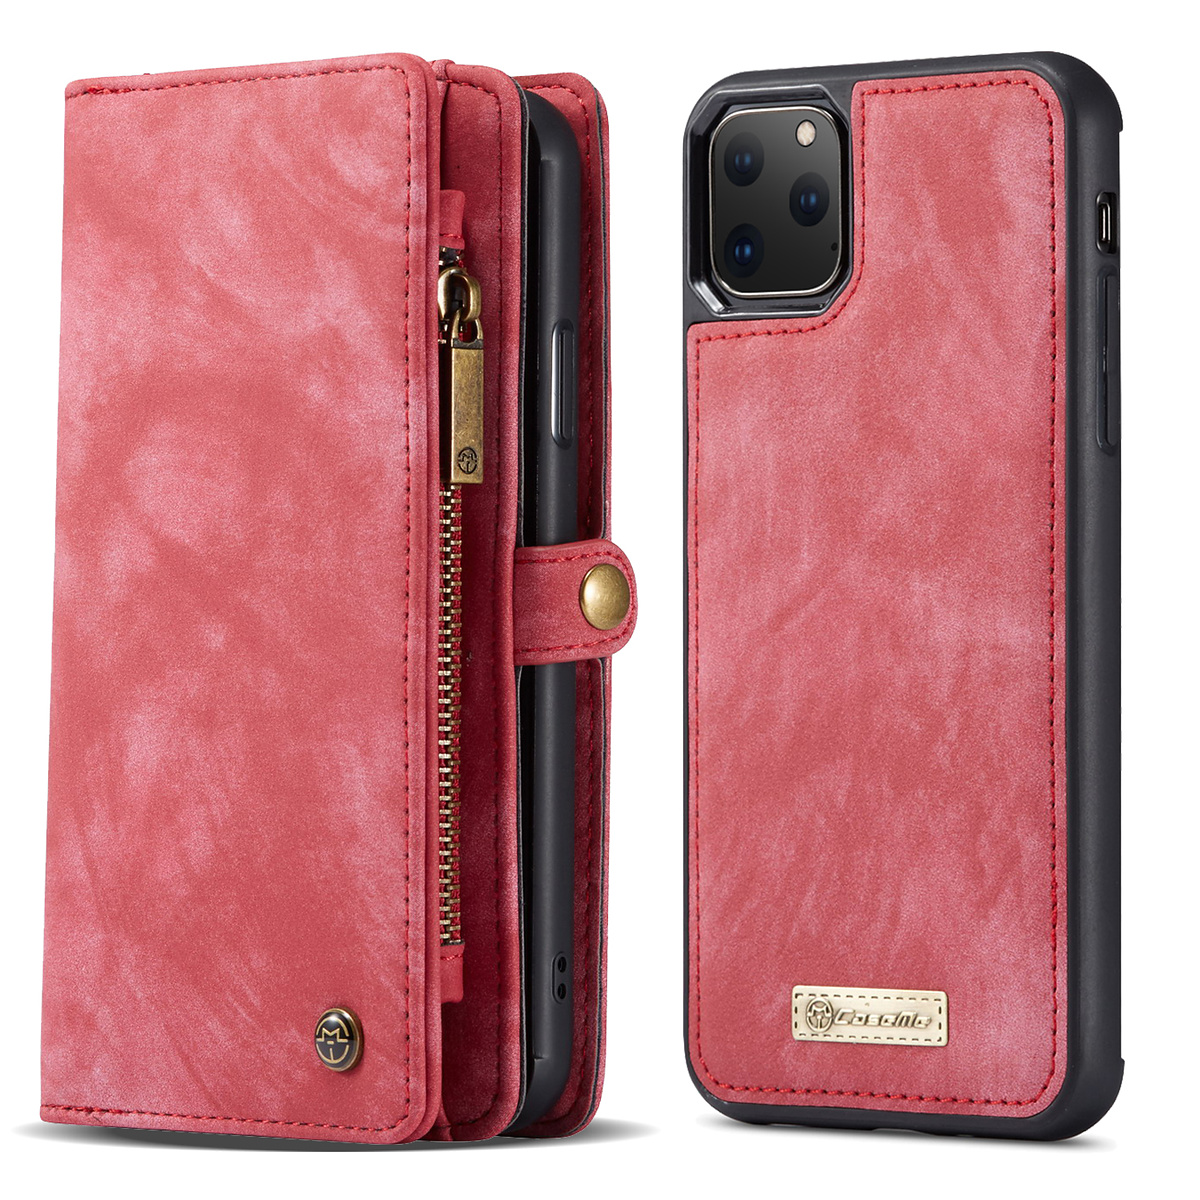 CaseMe läderfodral med magnetskal till iPhone 11 Pro Max, röd